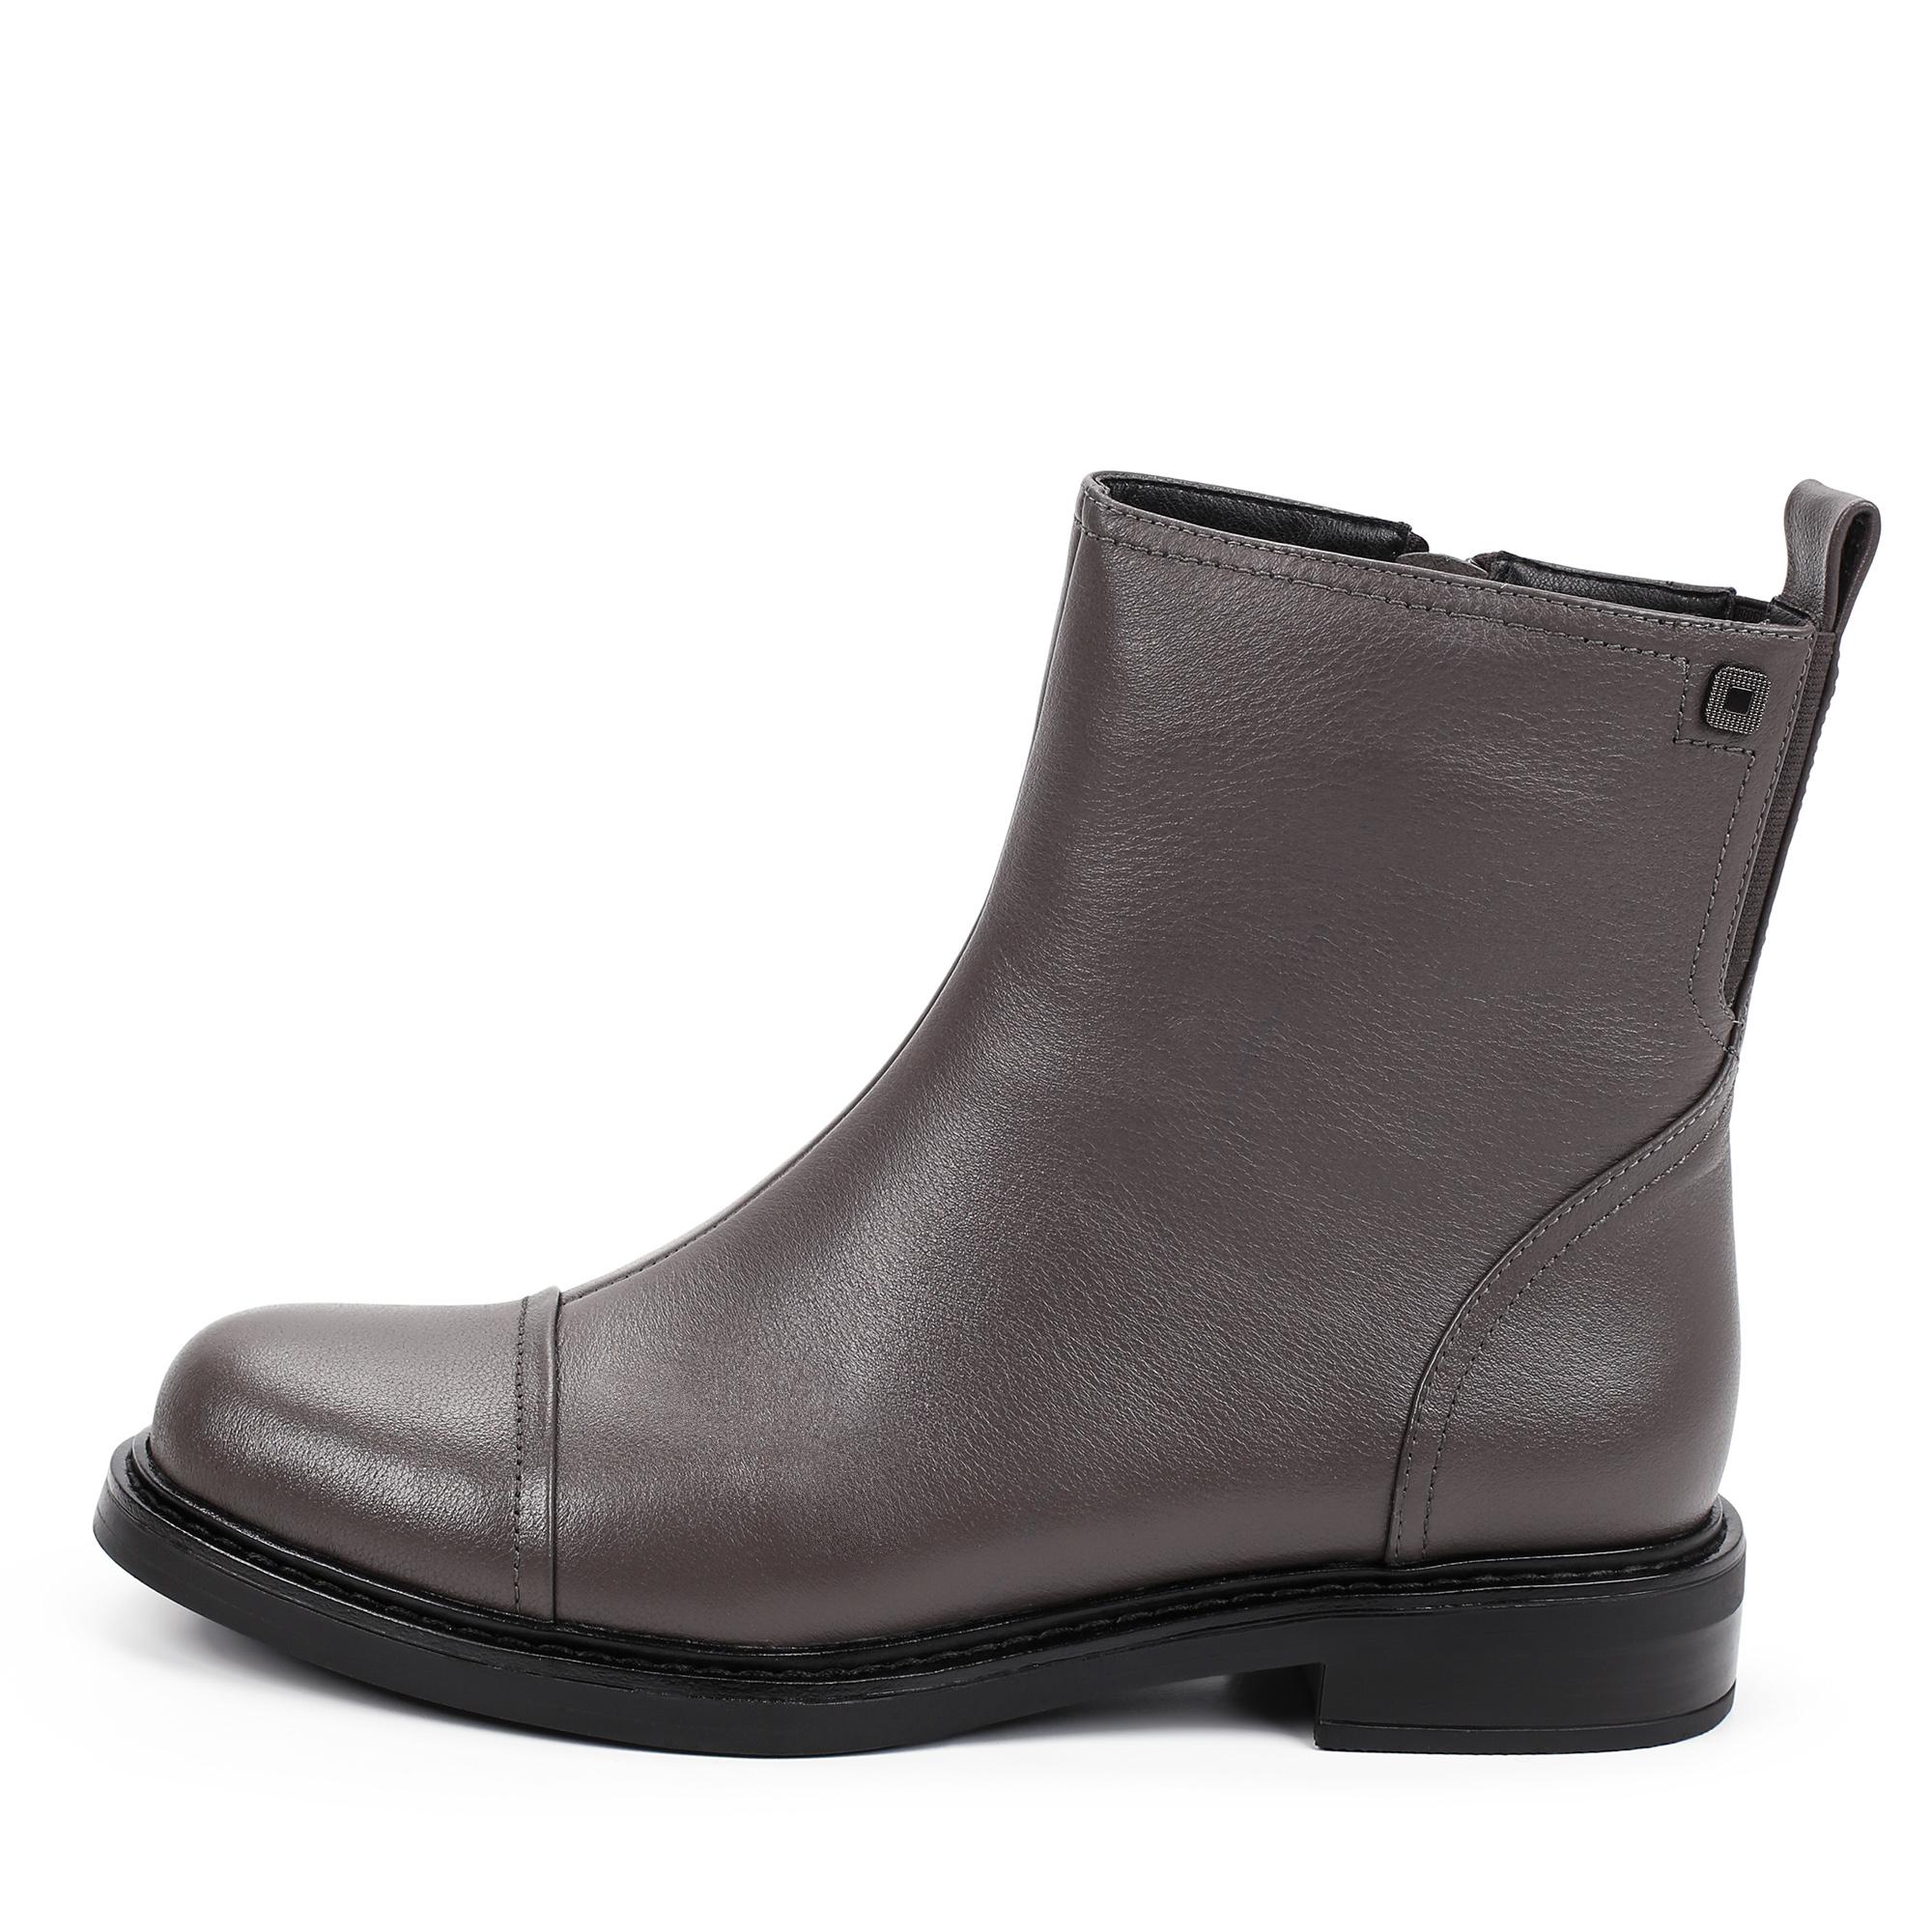 Ботинки Thomas Munz 113-200A-3110